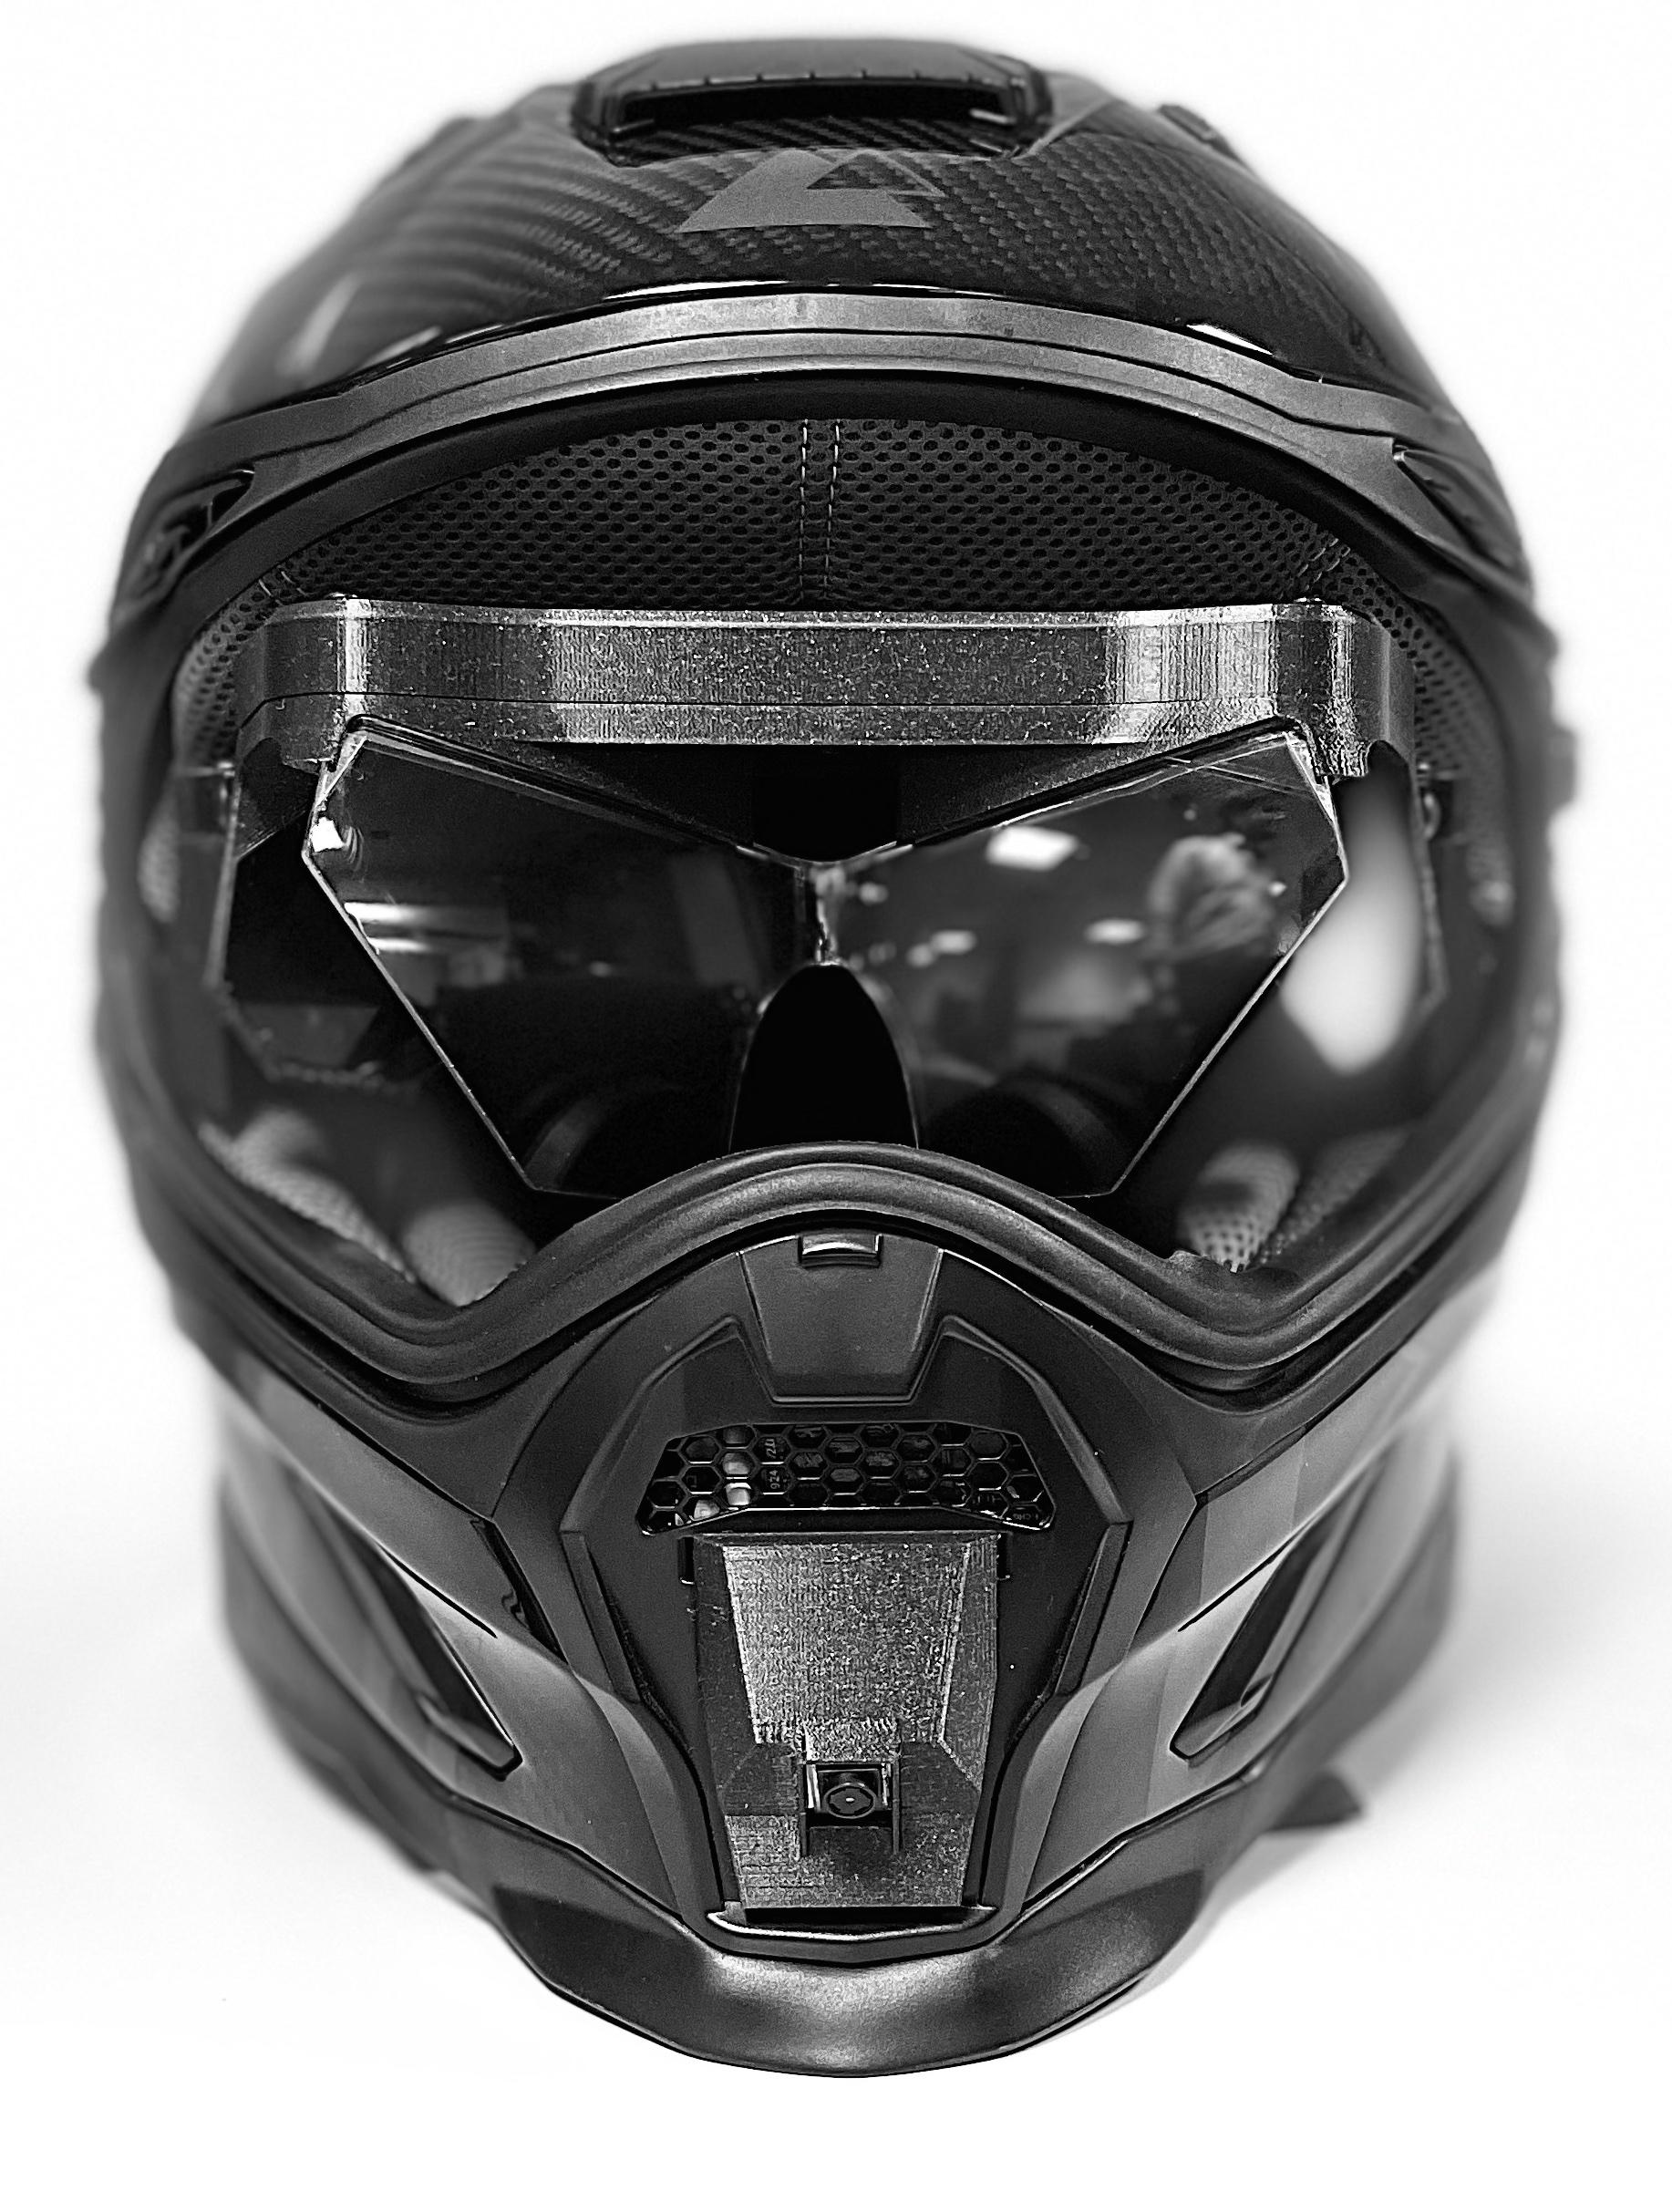 Curve warning helmet with AR